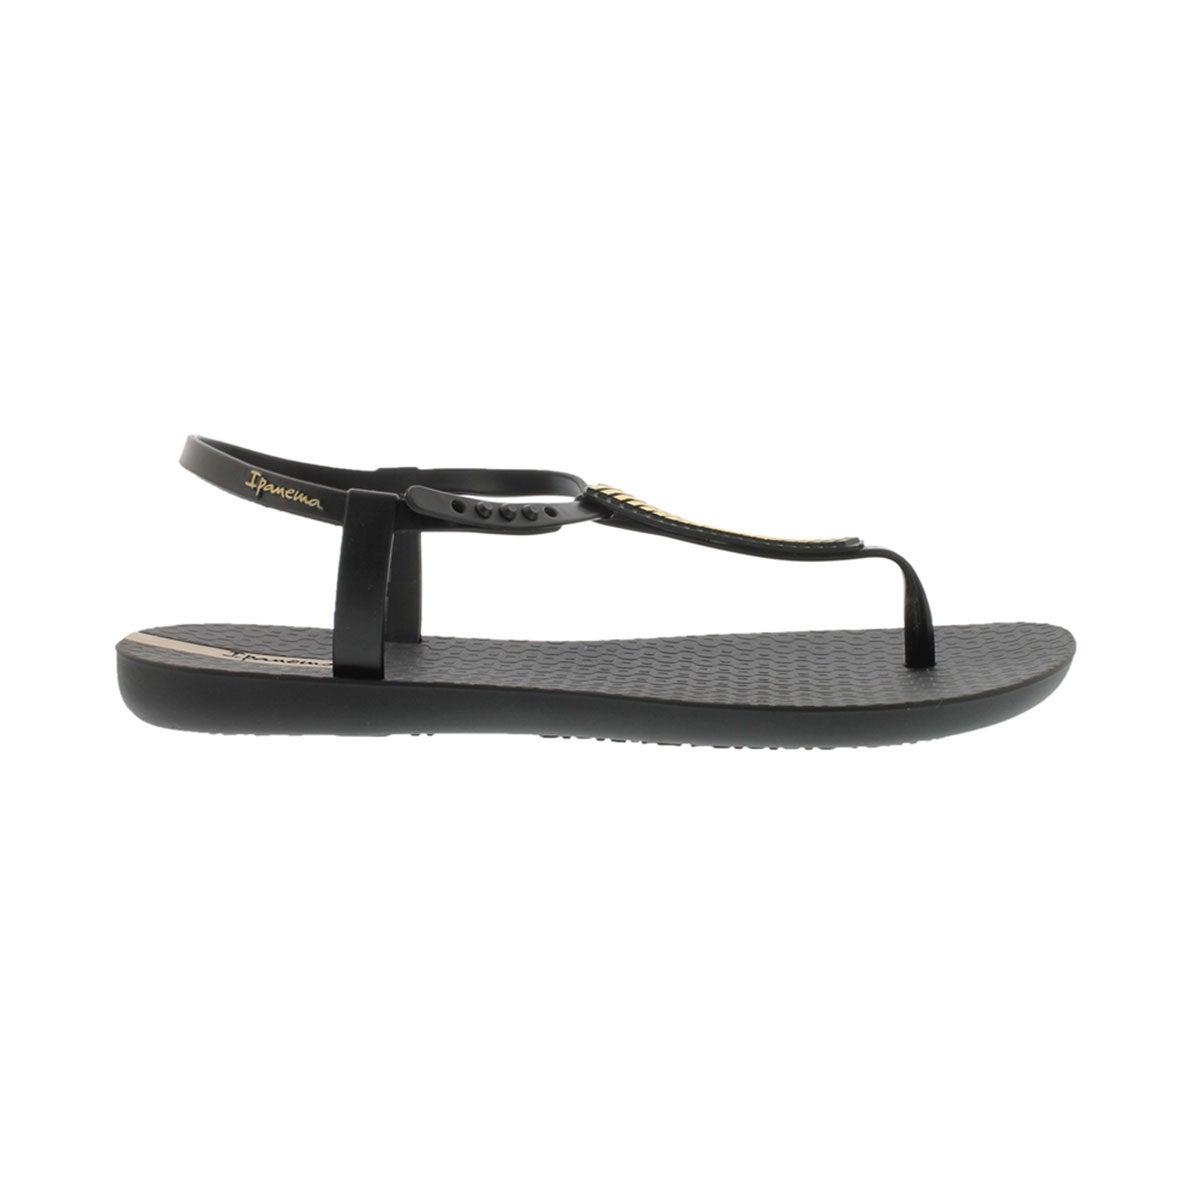 Lds Eva black/gold t-strap sandal